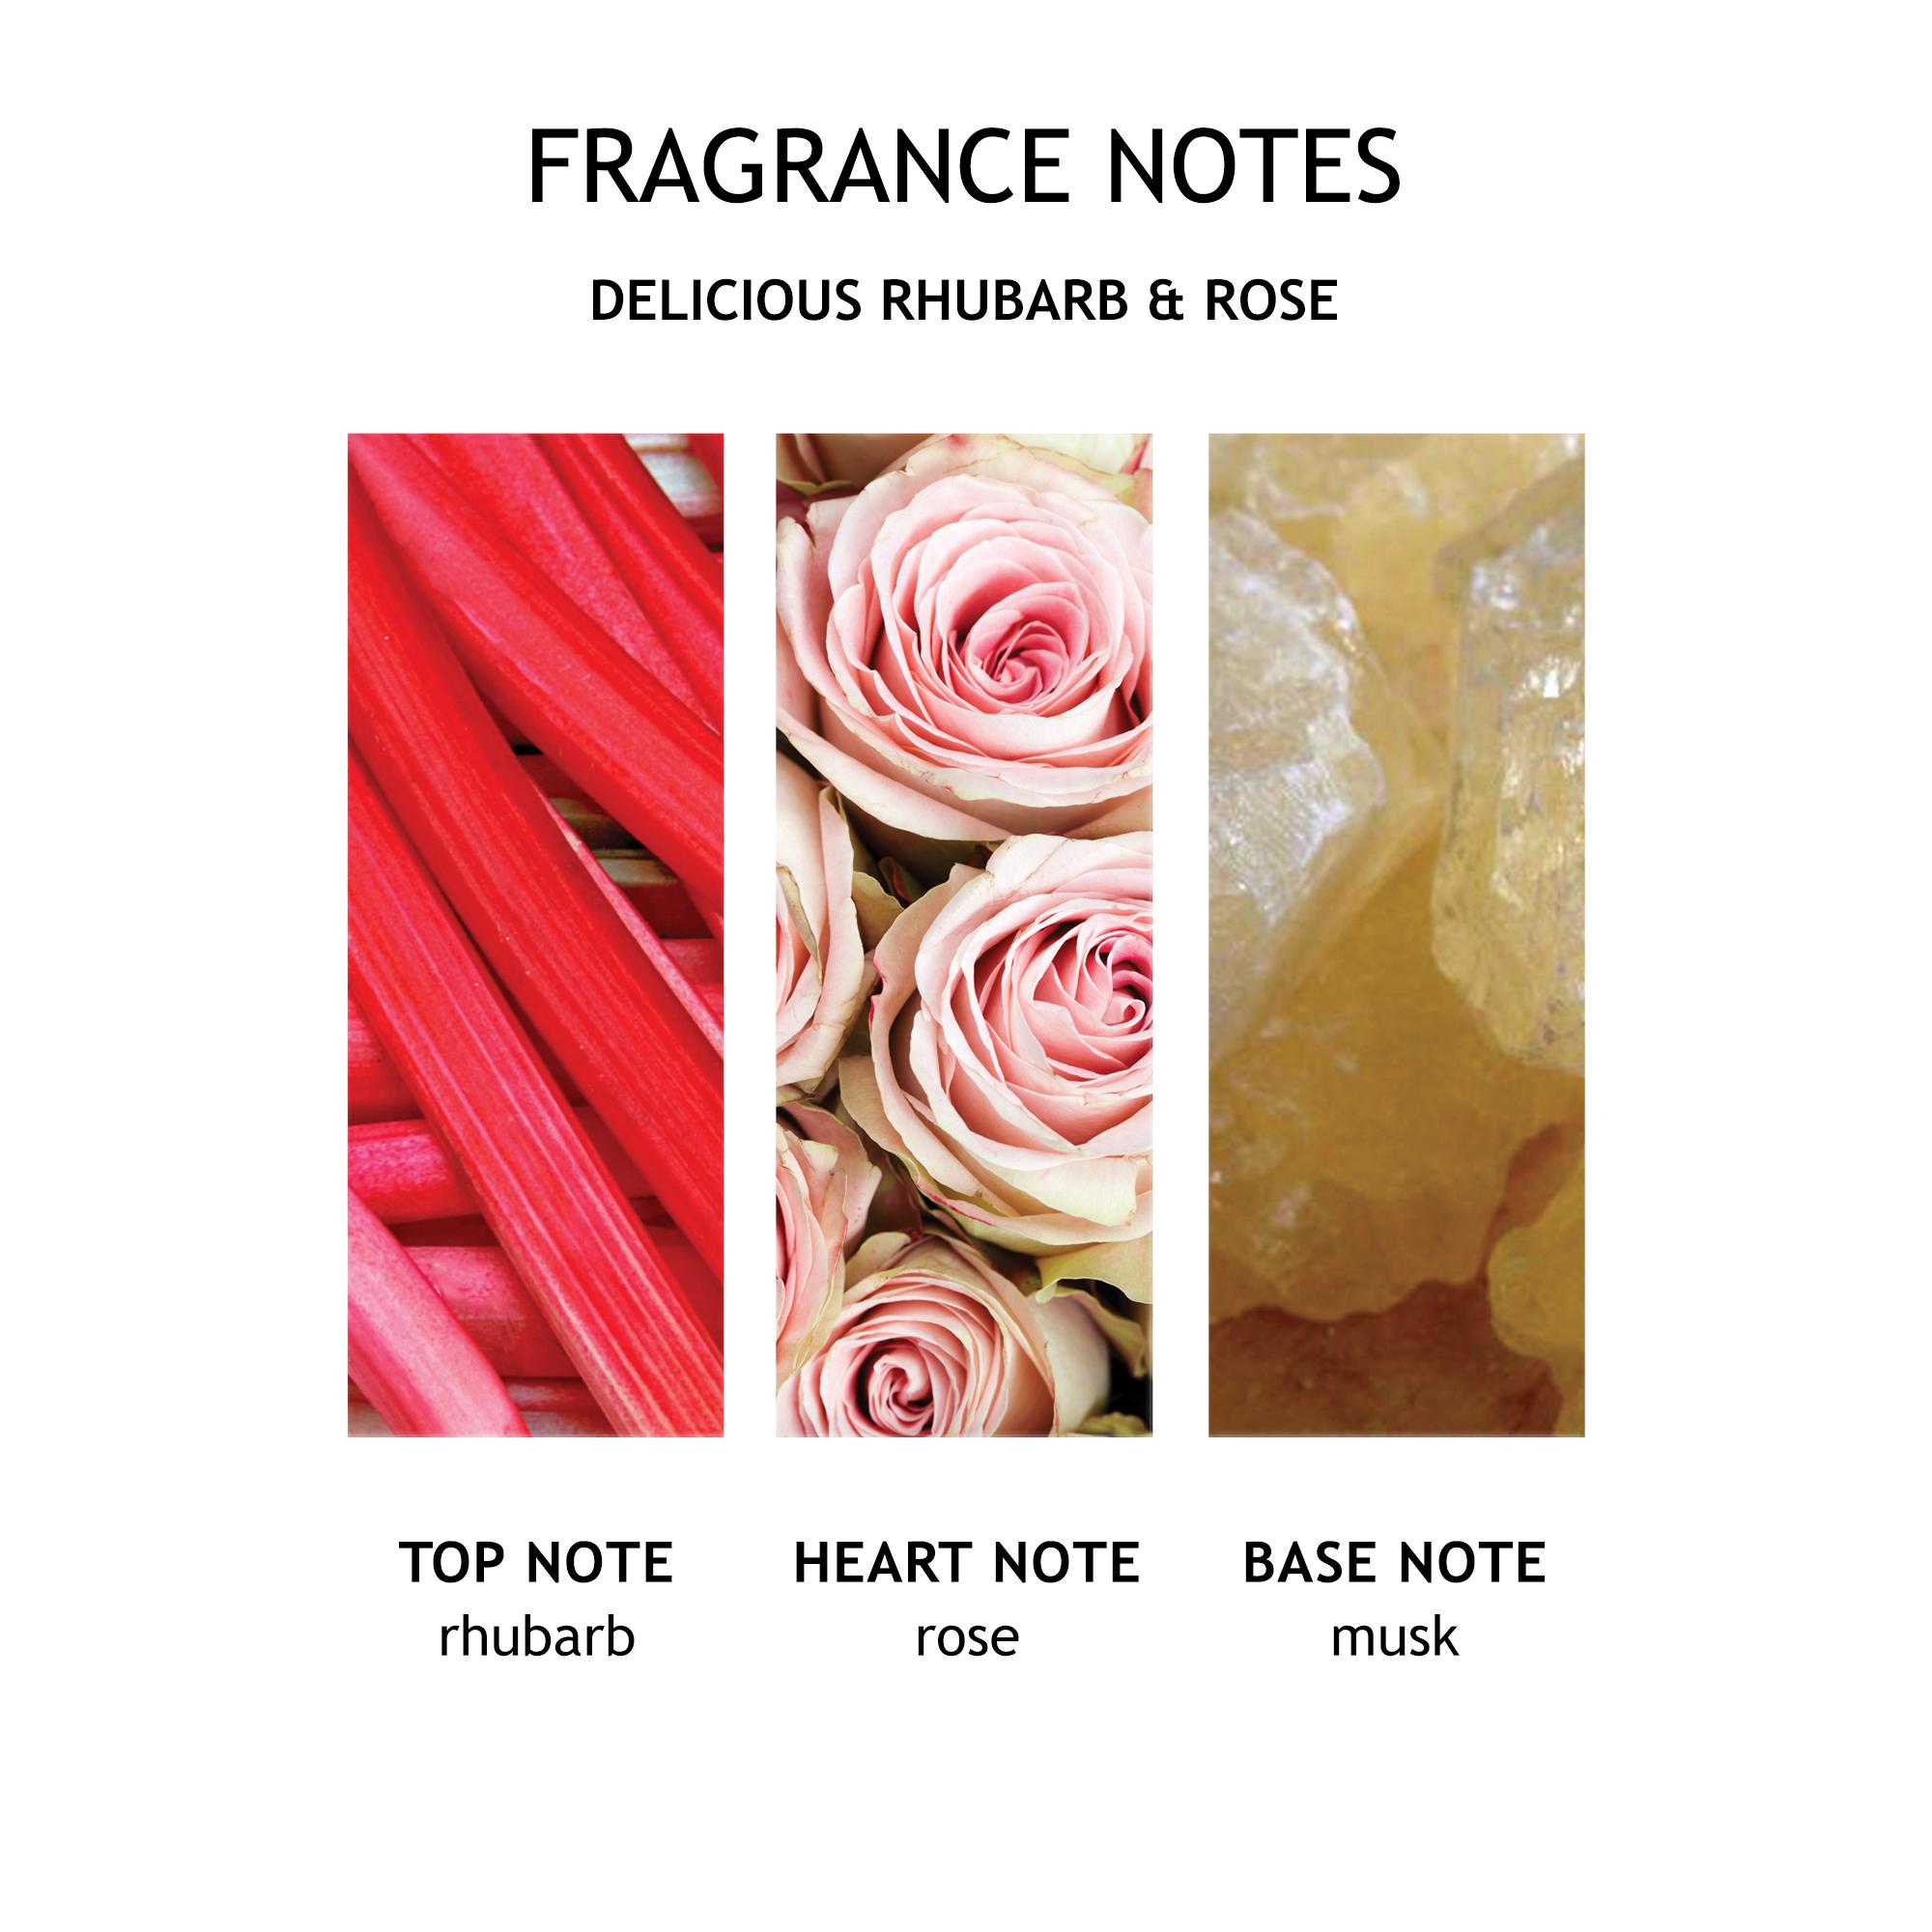 Delicious Rhubarb & Rose Vibrant Body oil